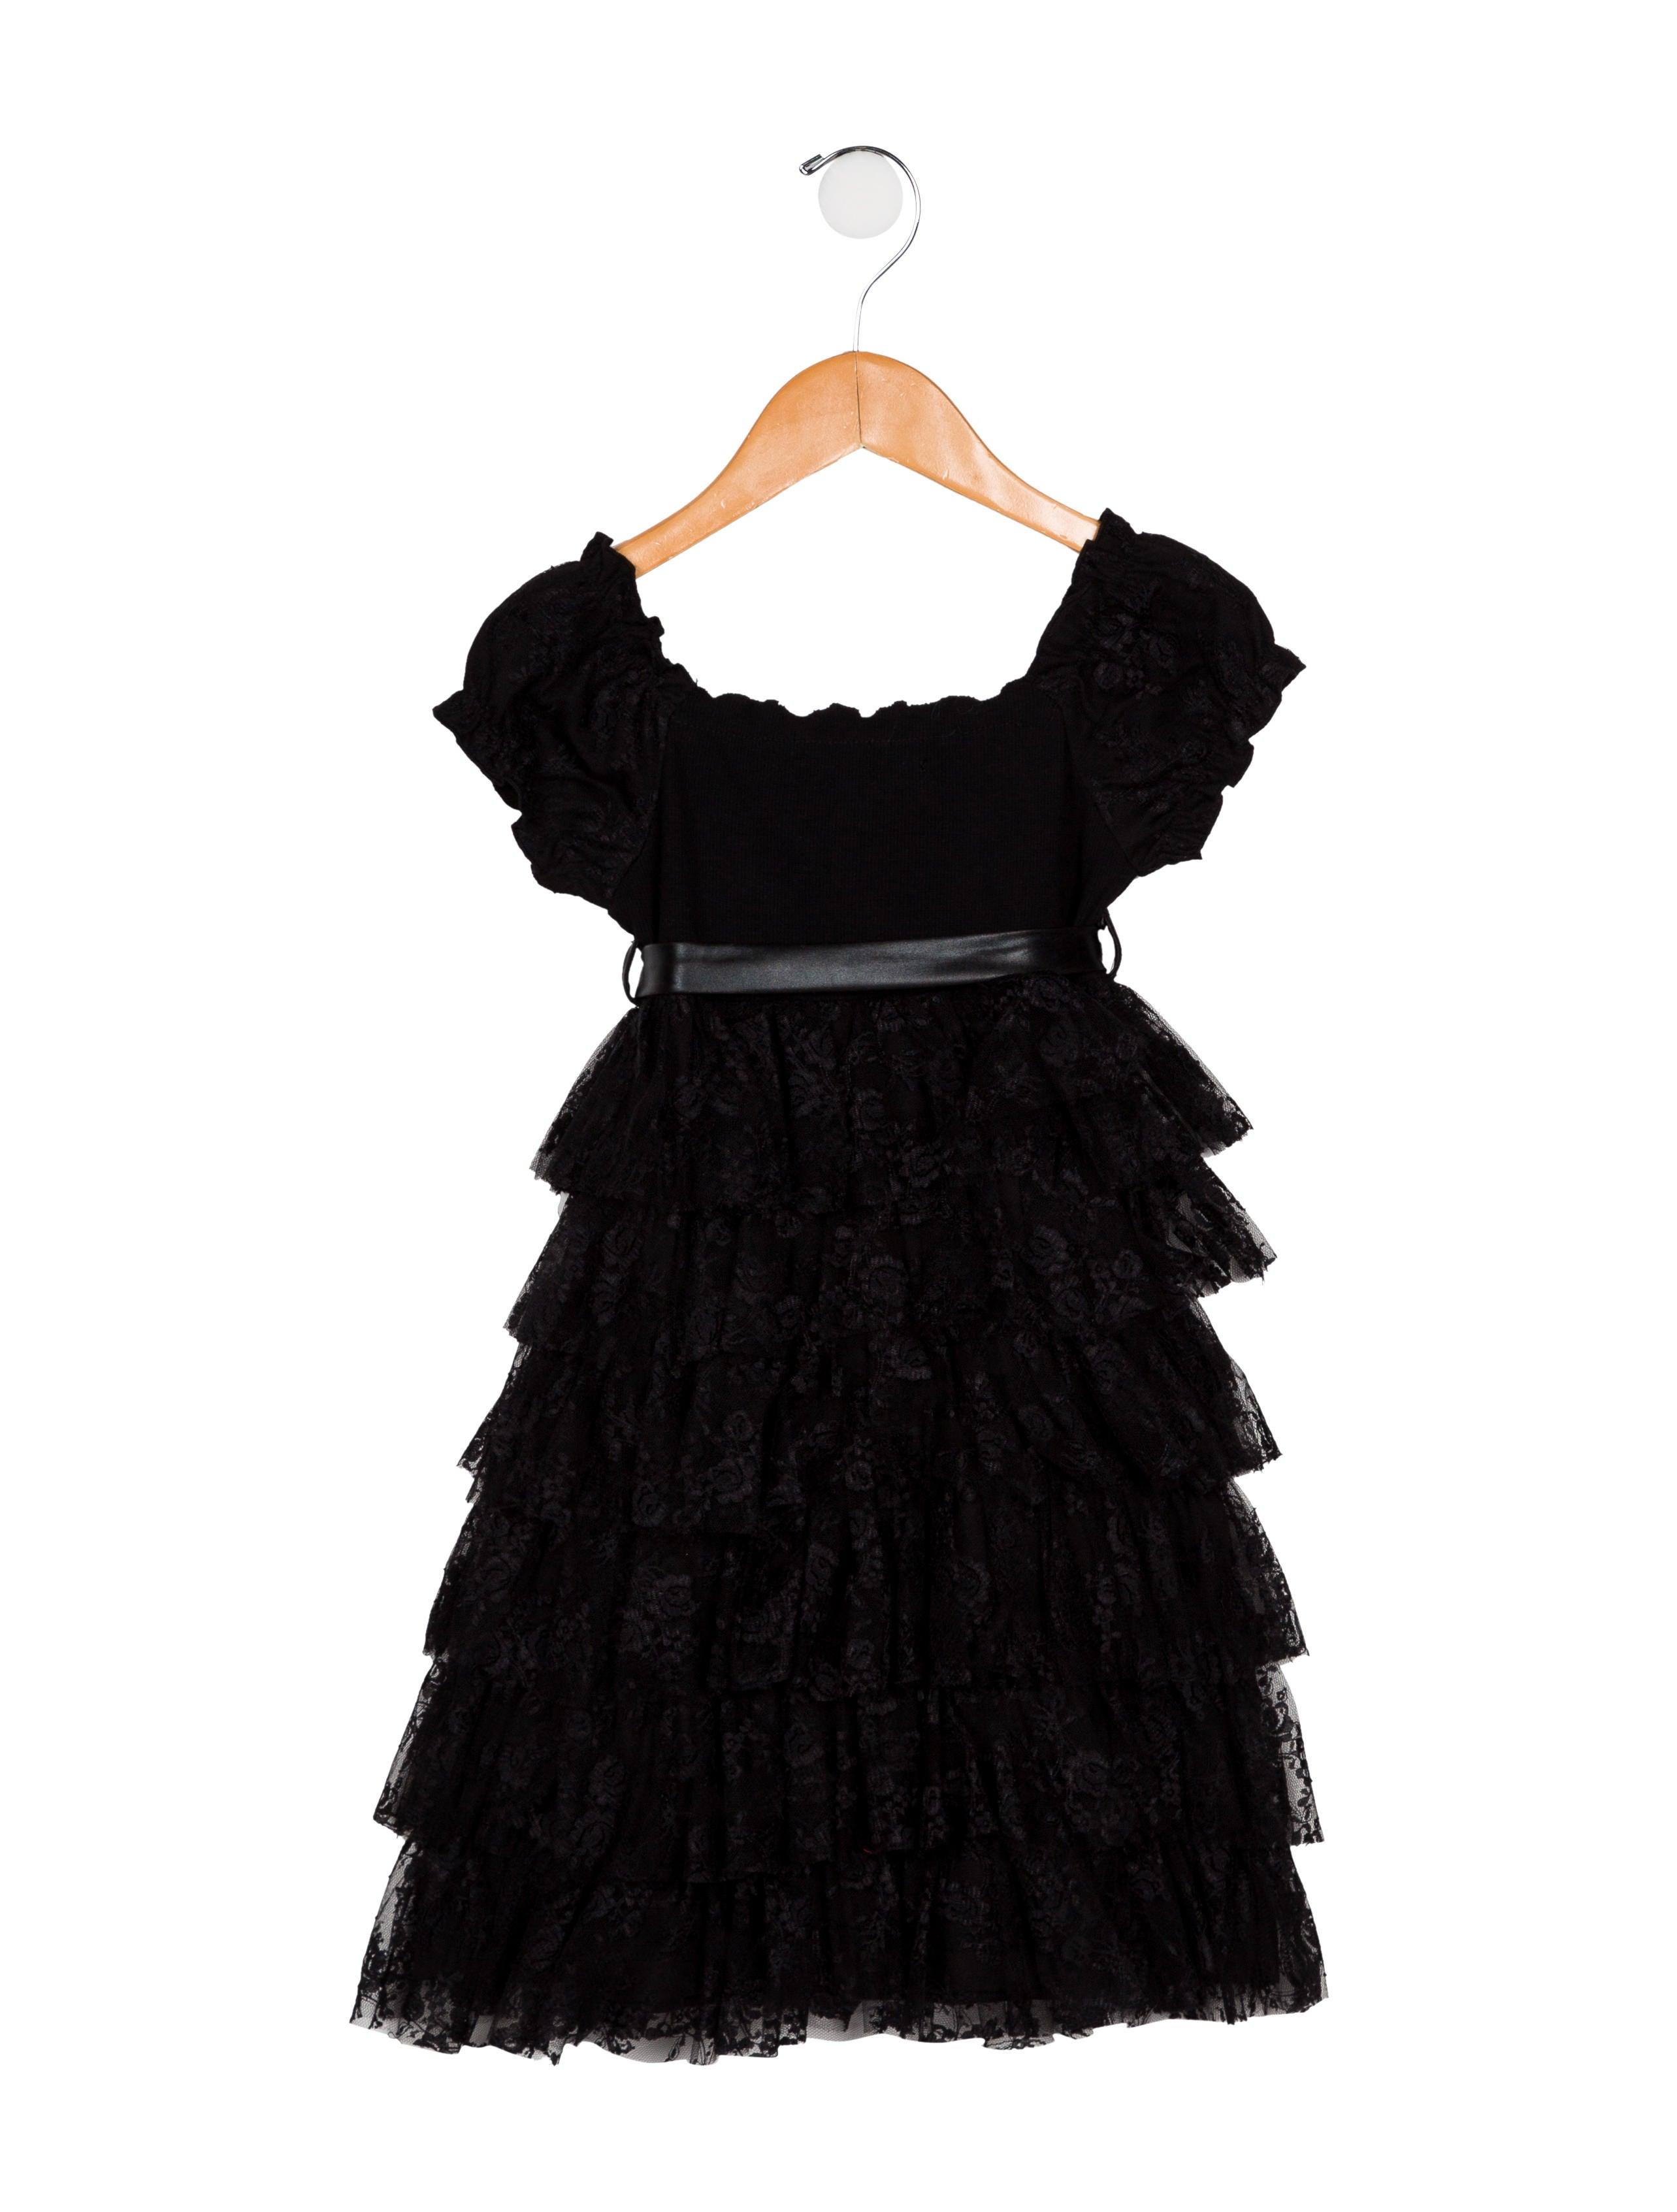 4fd9827dada9 Monnalisa Jakioo Girls  Lace-Accented A-Line Dress - Girls ...